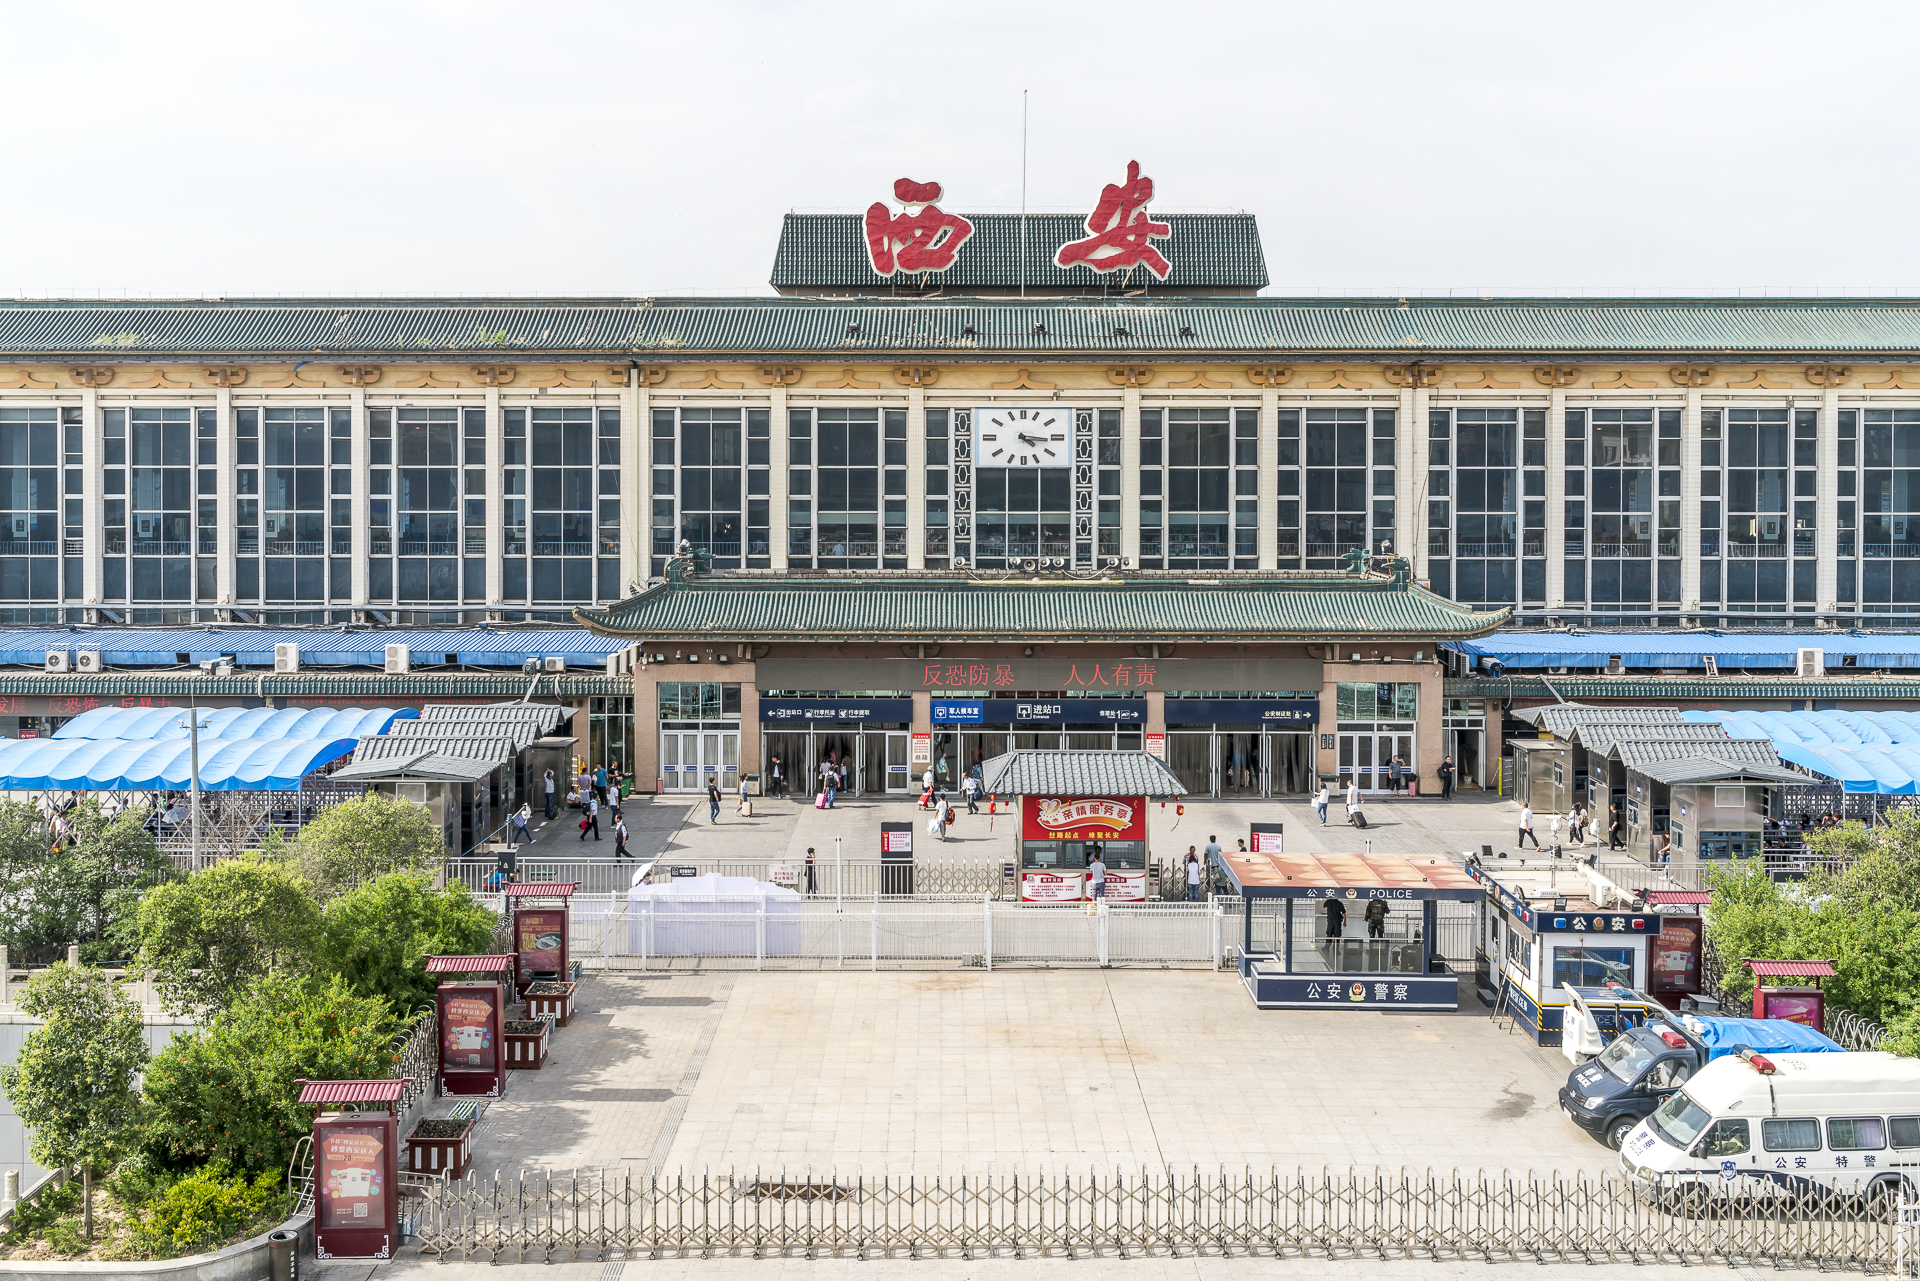 Bahnhof Xi'an